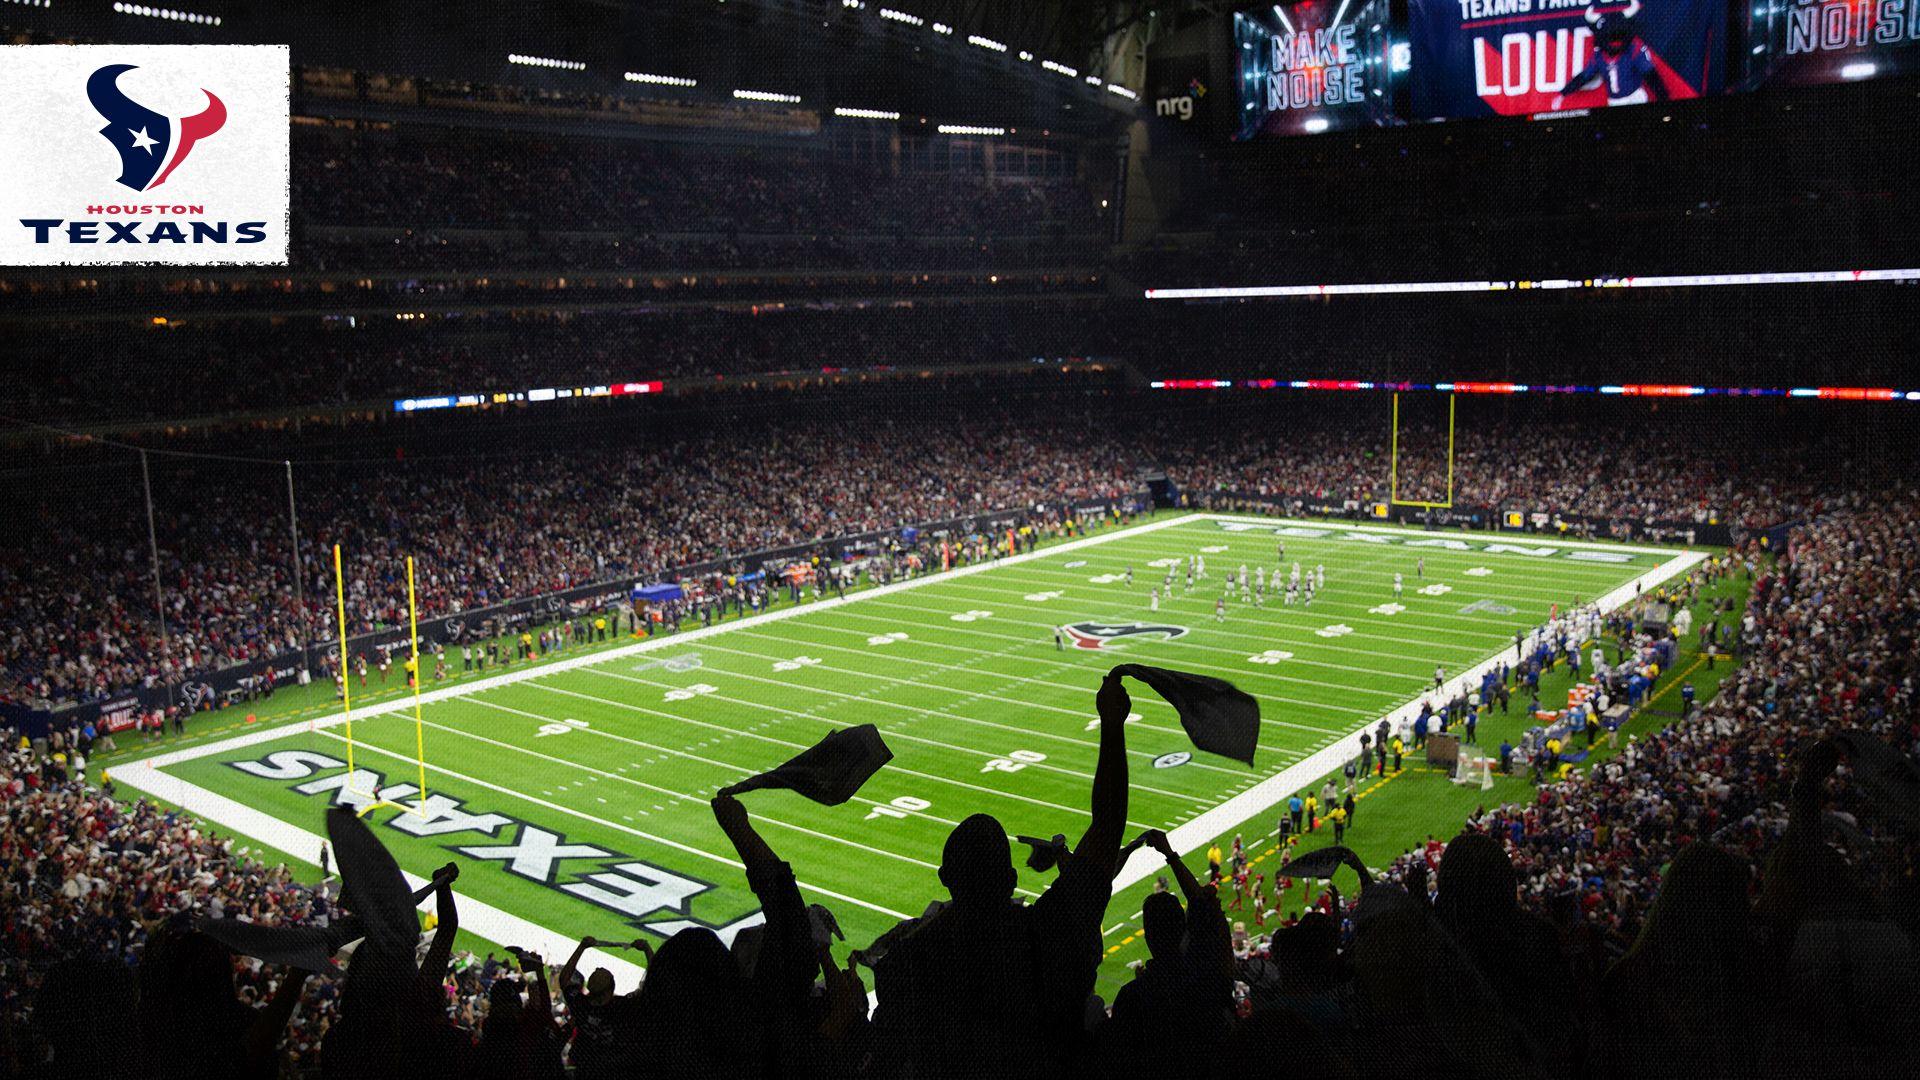 Zoom_Texans_1920x1080_Stadium_V4